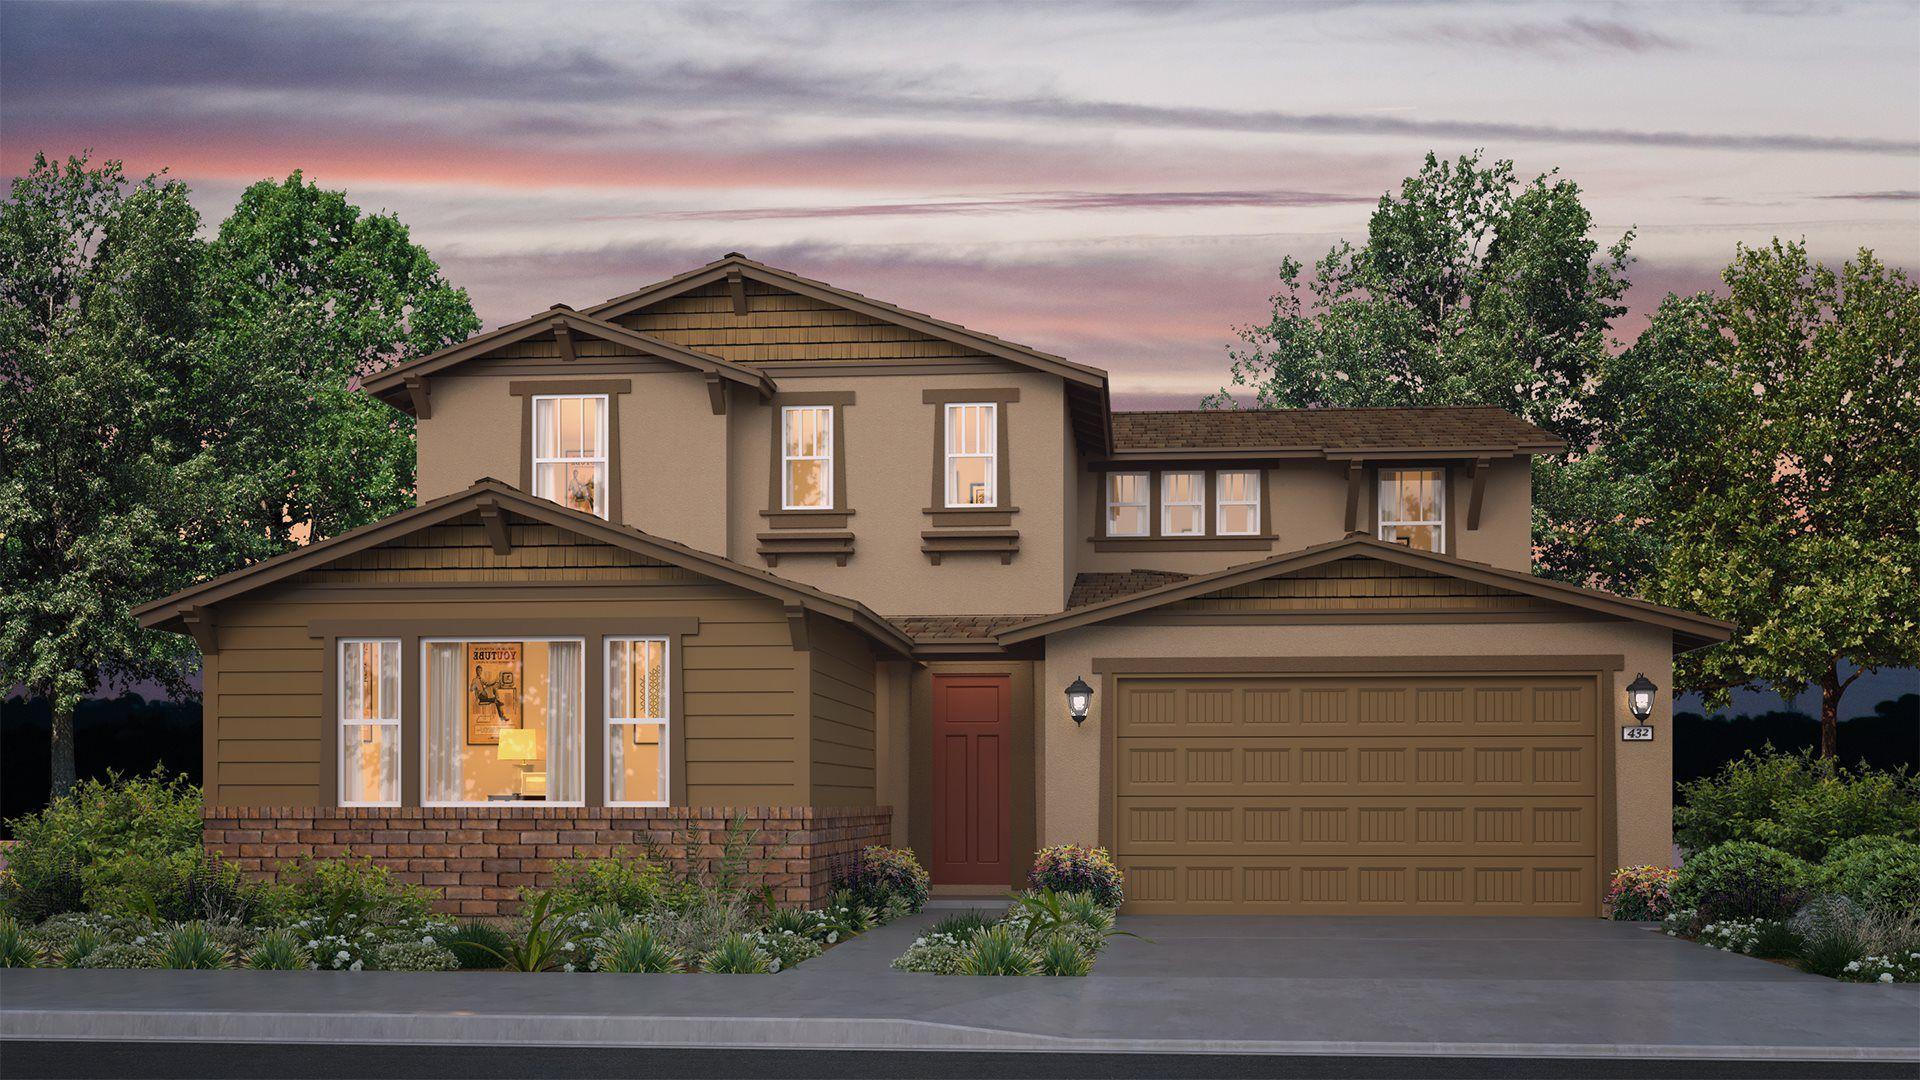 Residence 3312 | Elevation B